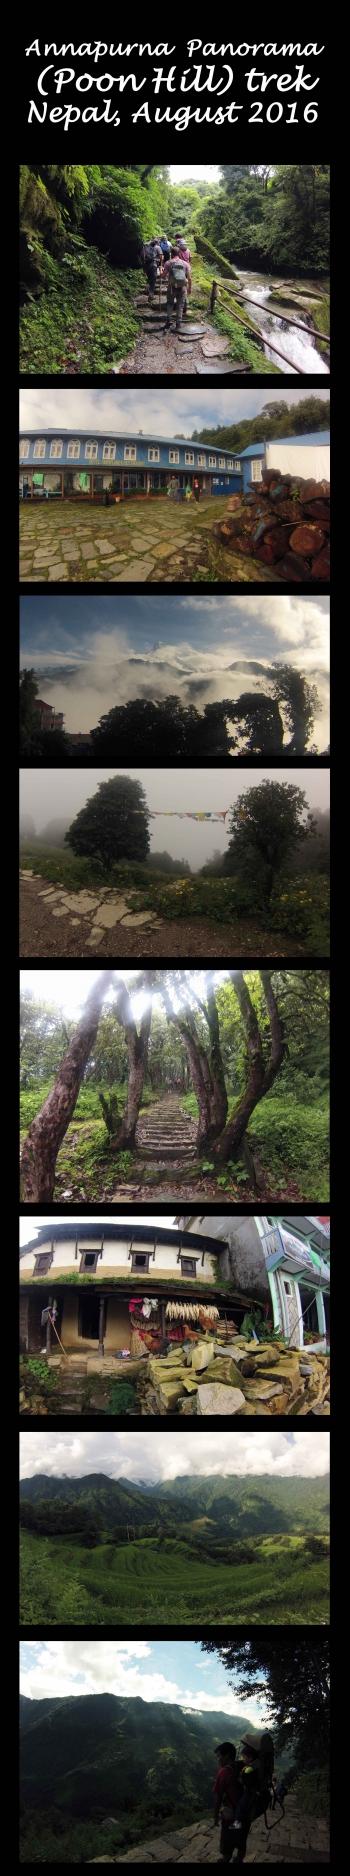 India,Nepal,trekking,August,monsoon,rains,Annapurna trail